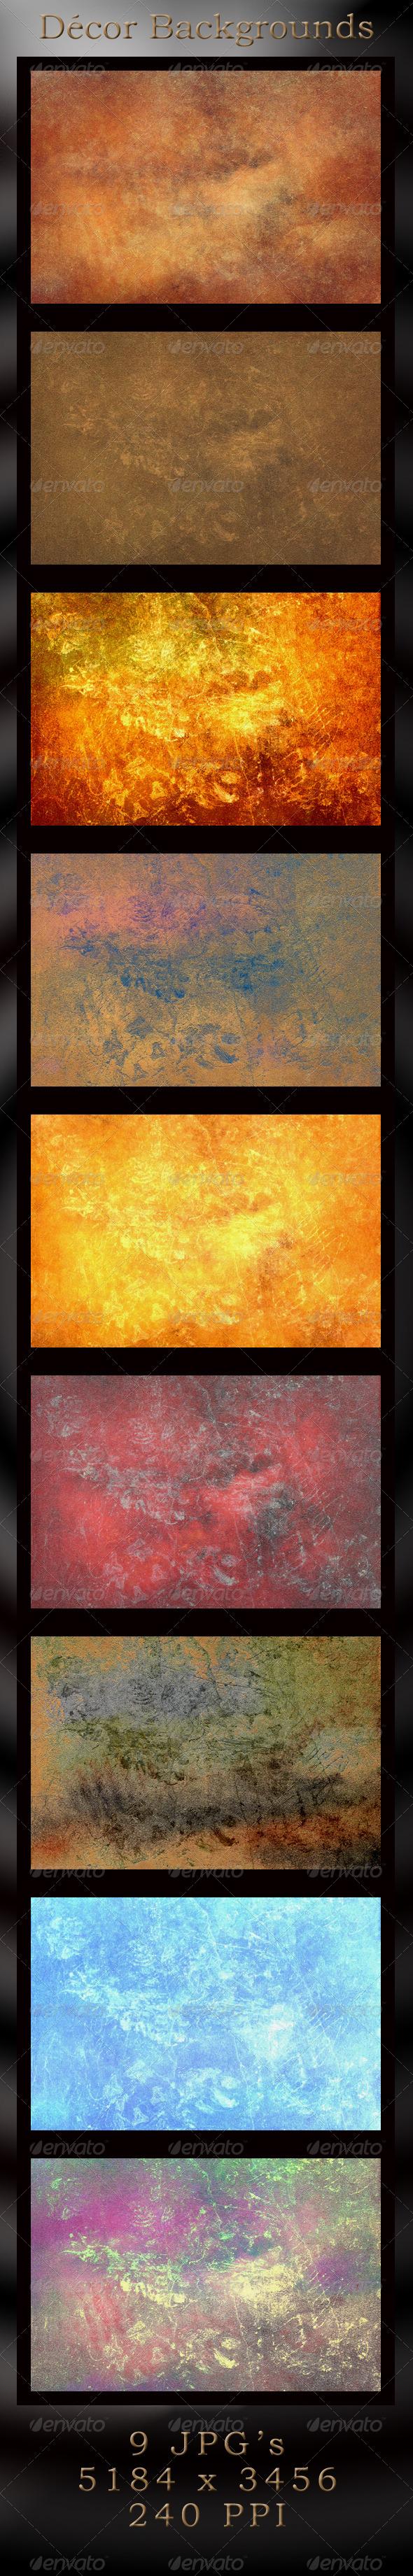 GraphicRiver Decor Craquelure Backgrounds 4427386